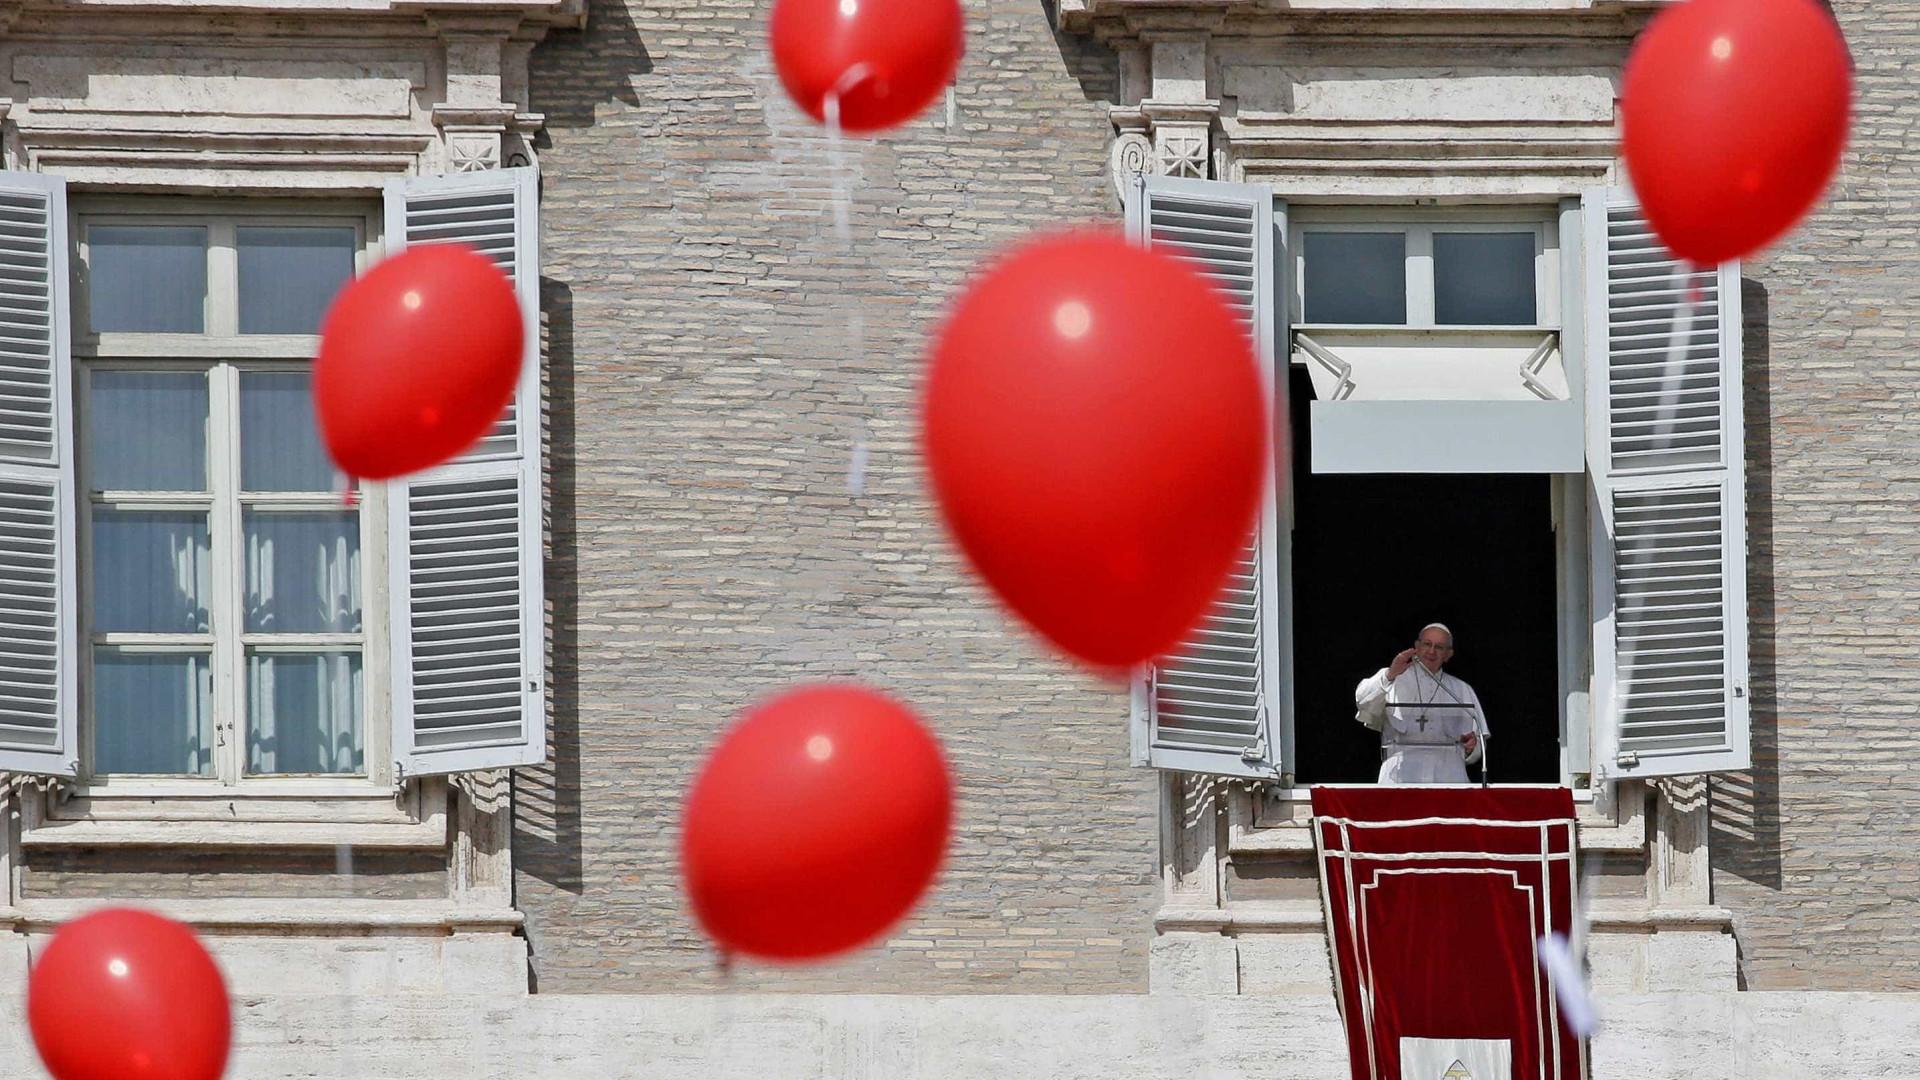 Após 5 anos como Papa, Francisco abre novo ciclo de desafios